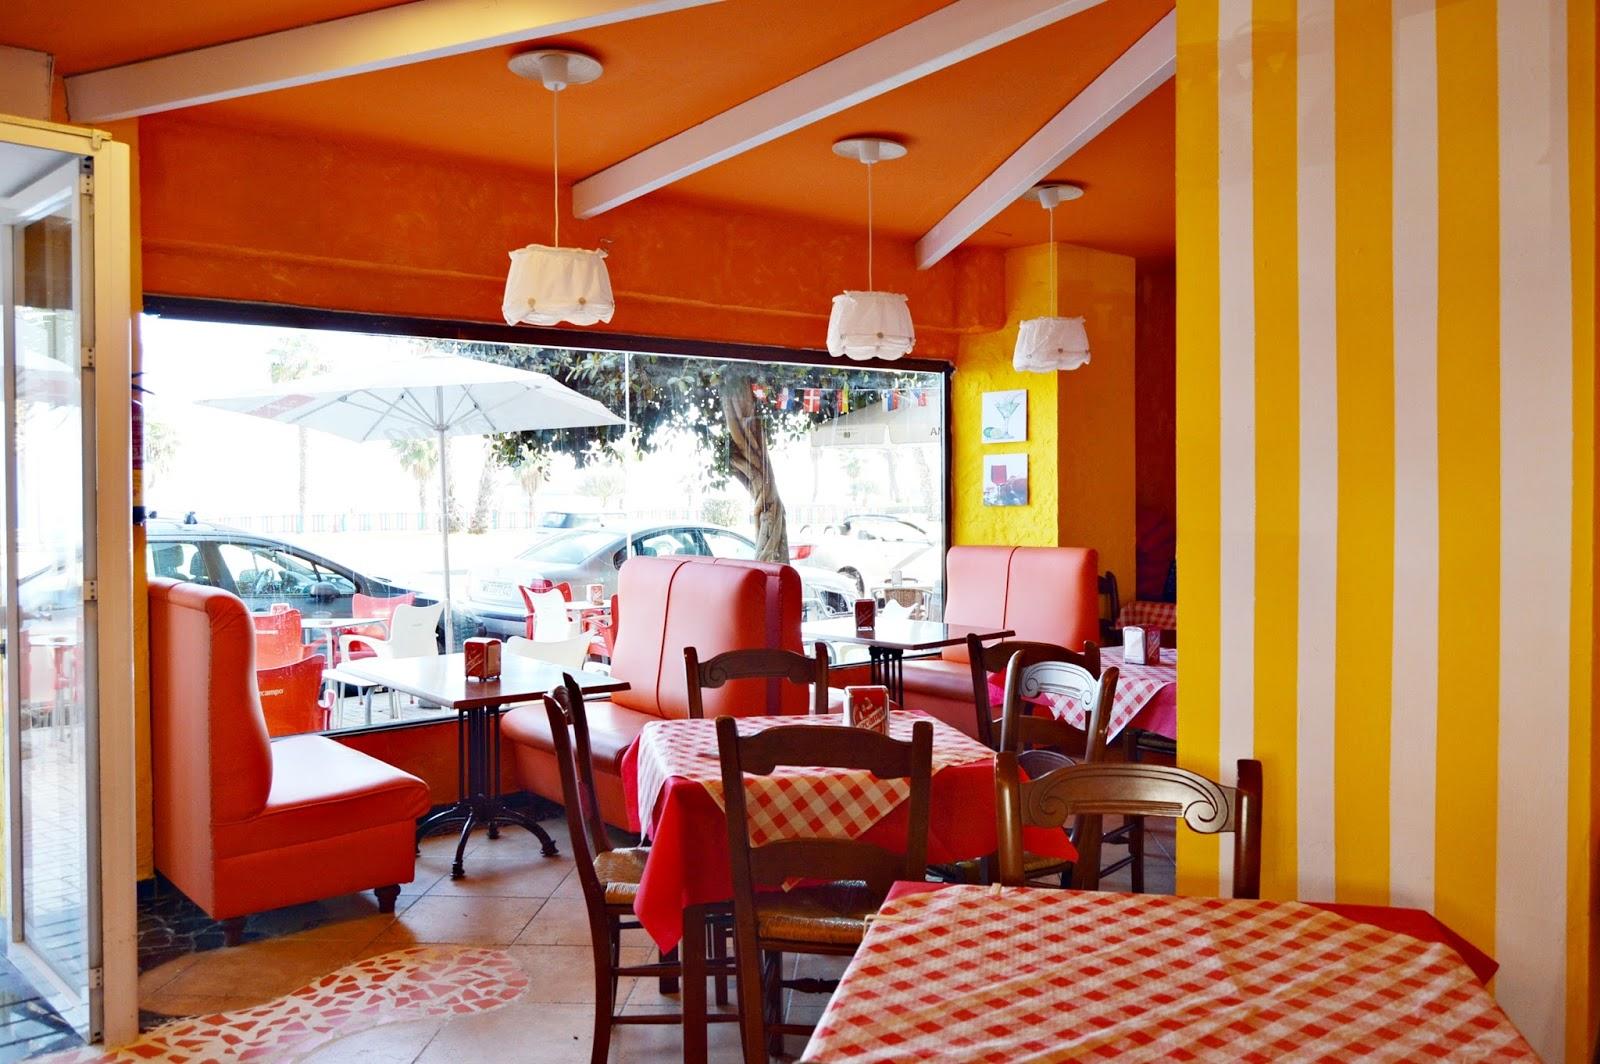 Bares y restaurantes en m laga pizzer a la casa de zio bello for Bello salon